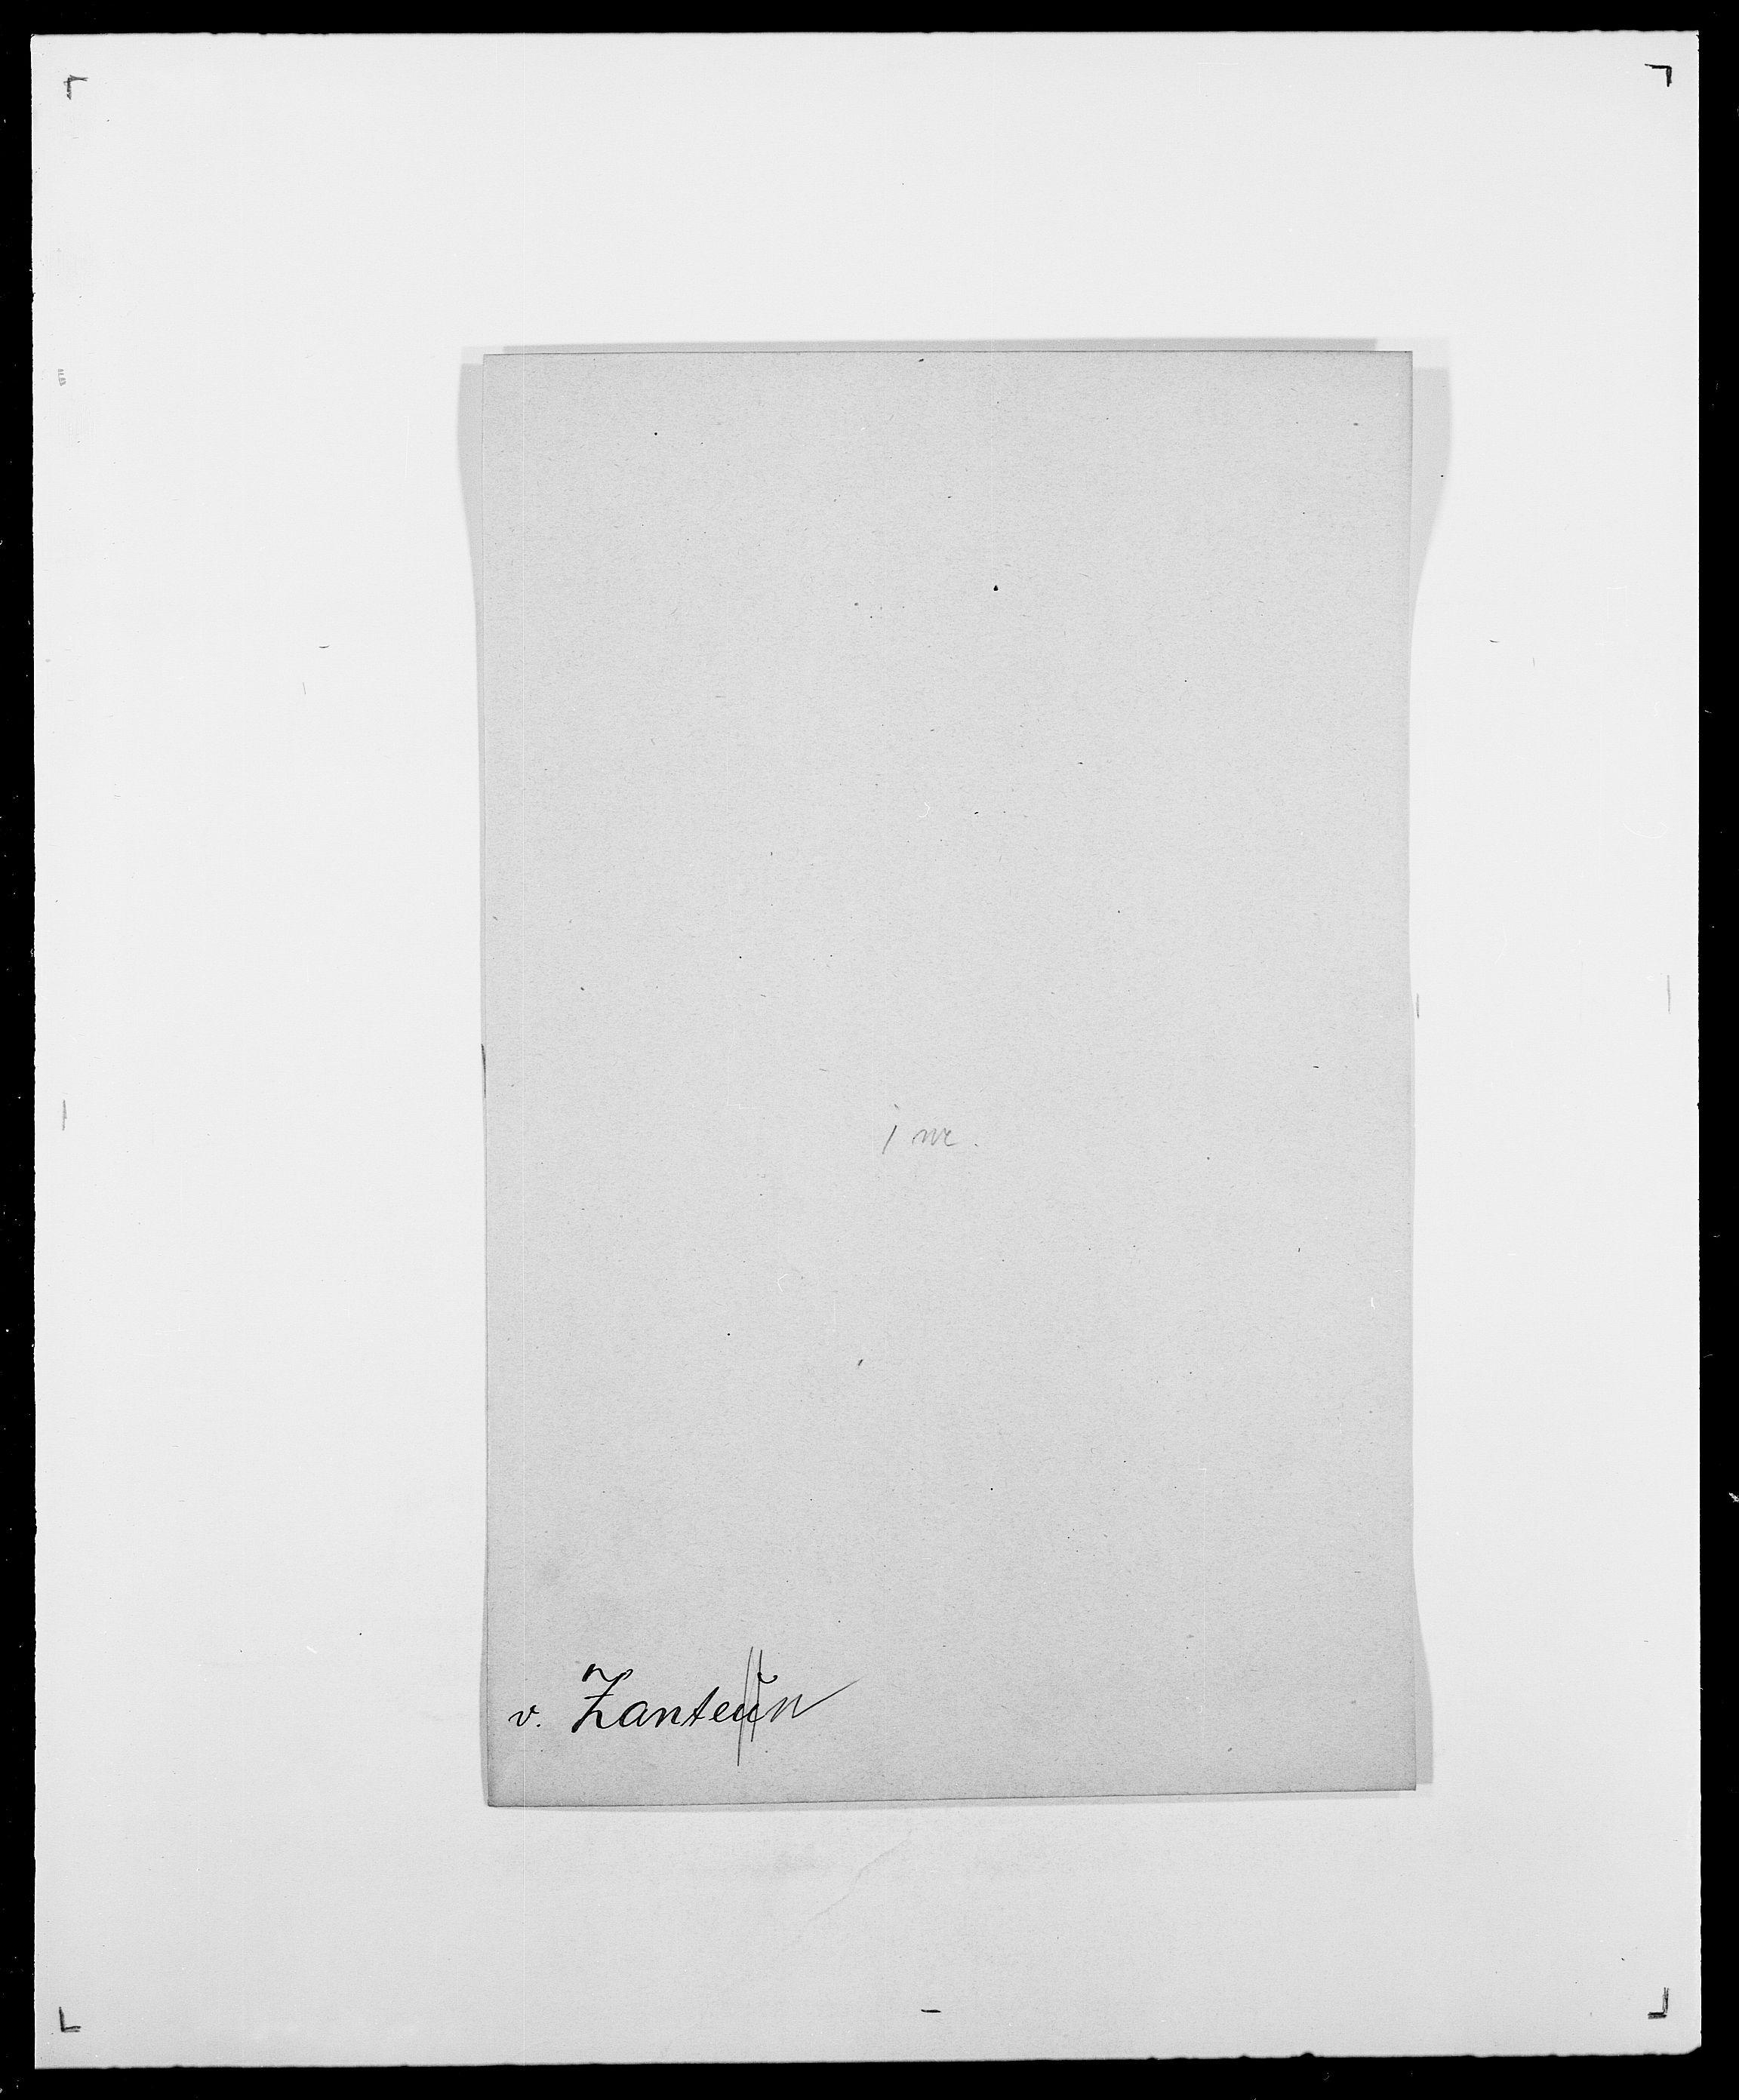 SAO, Delgobe, Charles Antoine - samling, D/Da/L0043: Wulfsberg - v. Zanten, s. 92